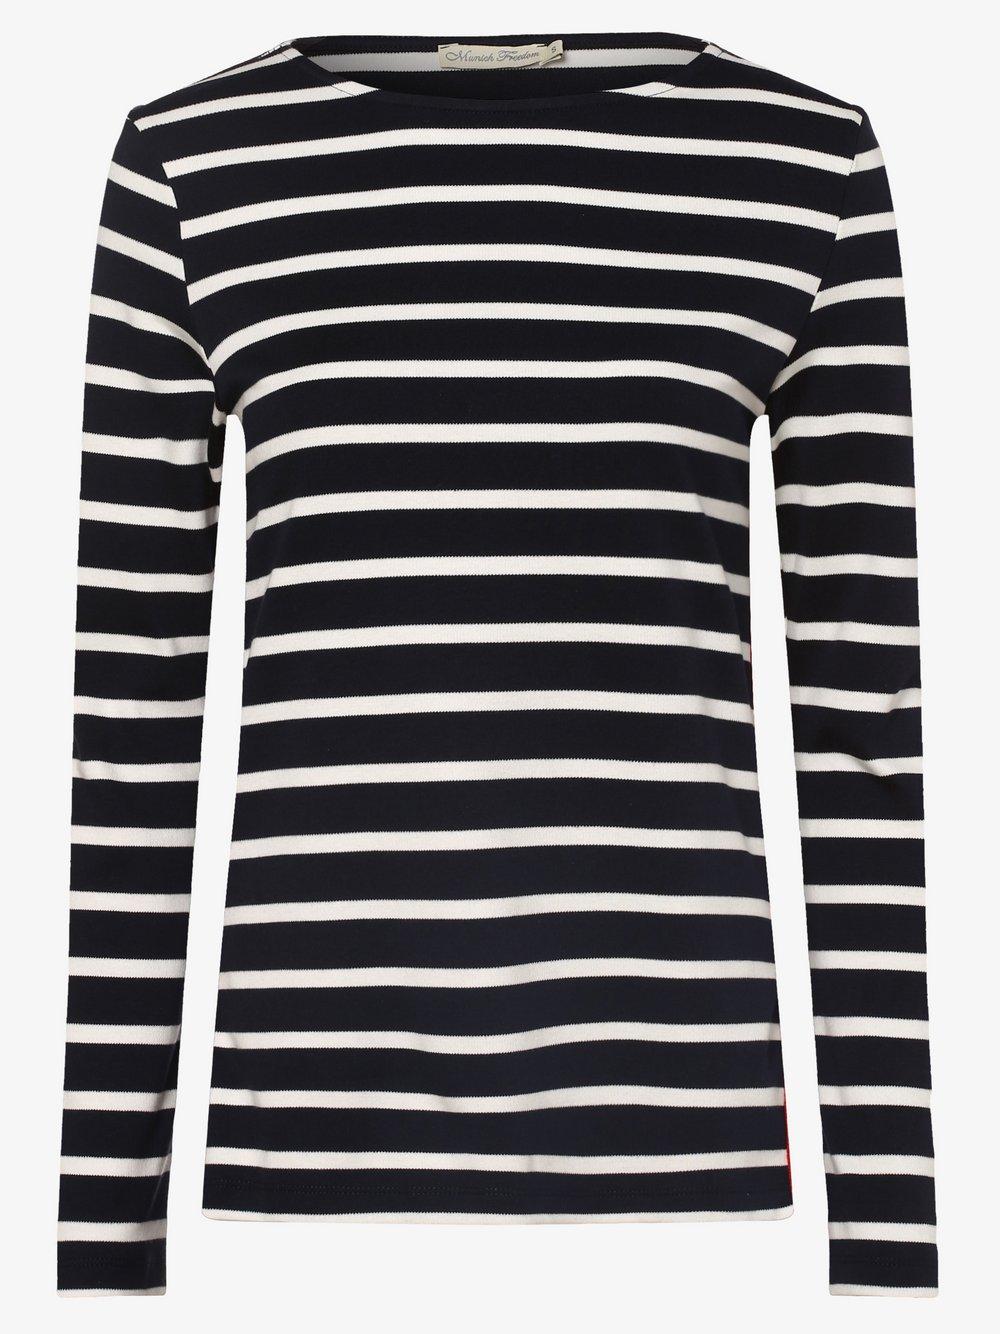 Munich Freedom – Damska koszulka z długim rękawem, niebieski Van Graaf 456663-0002